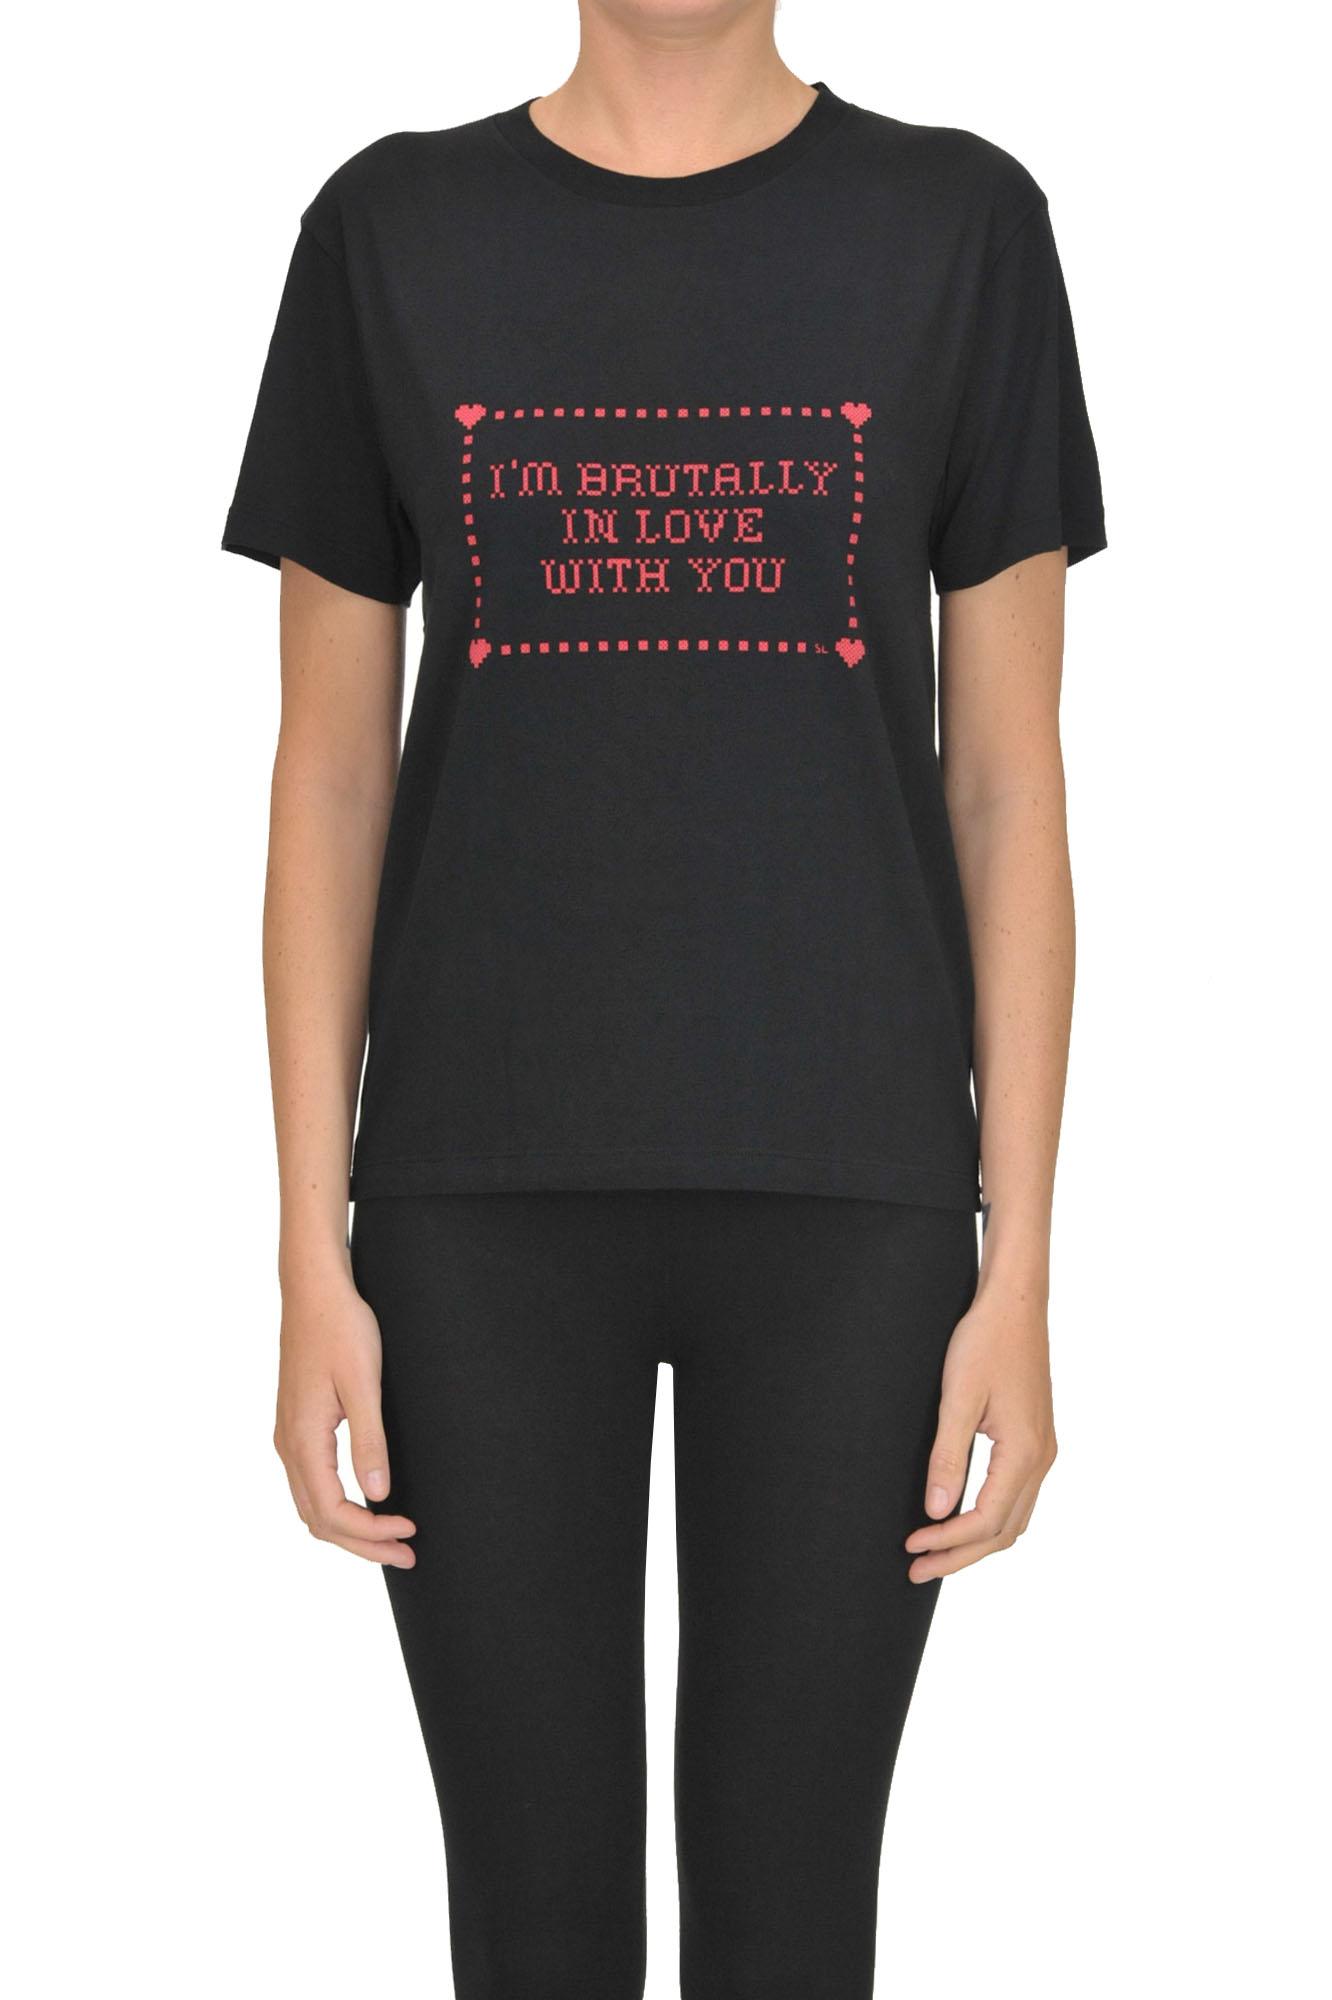 Saint Laurent Printed Cotton T-Shirt In Black